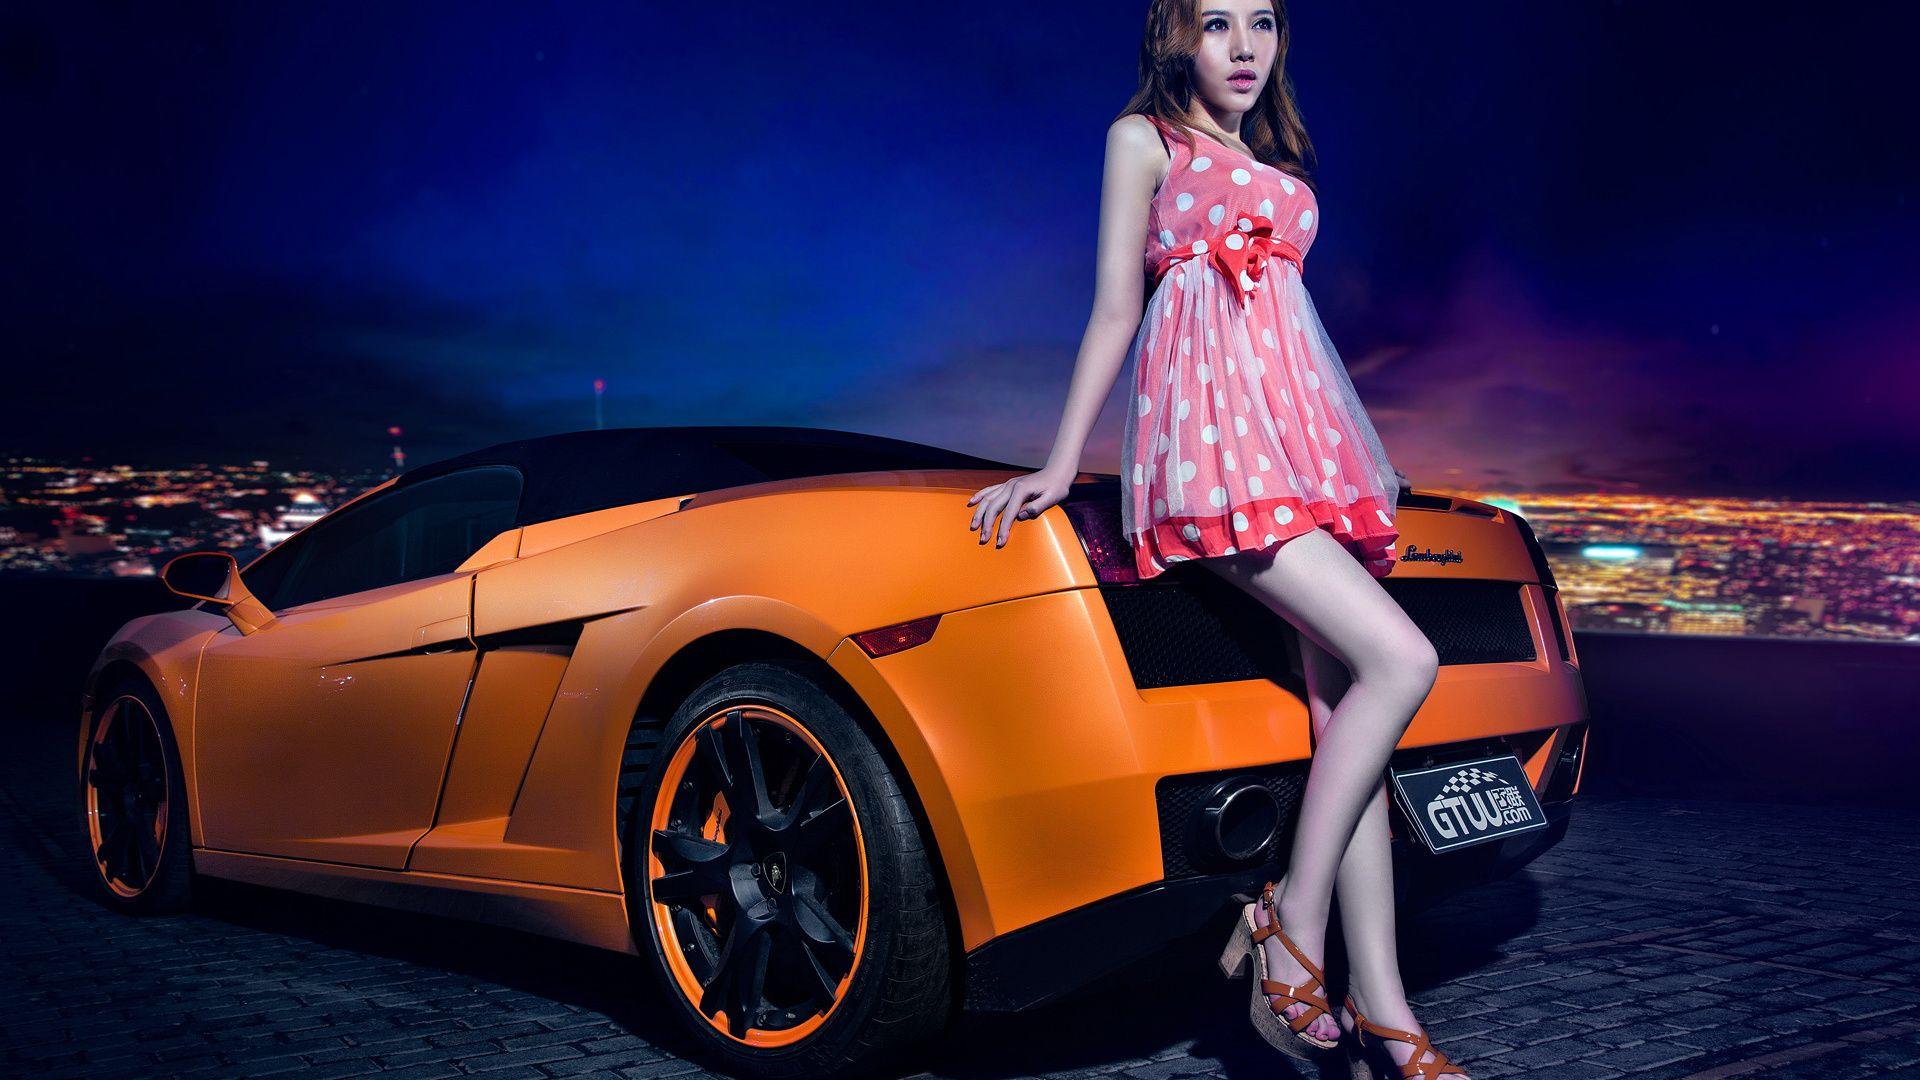 Car Girl nice wallpaper